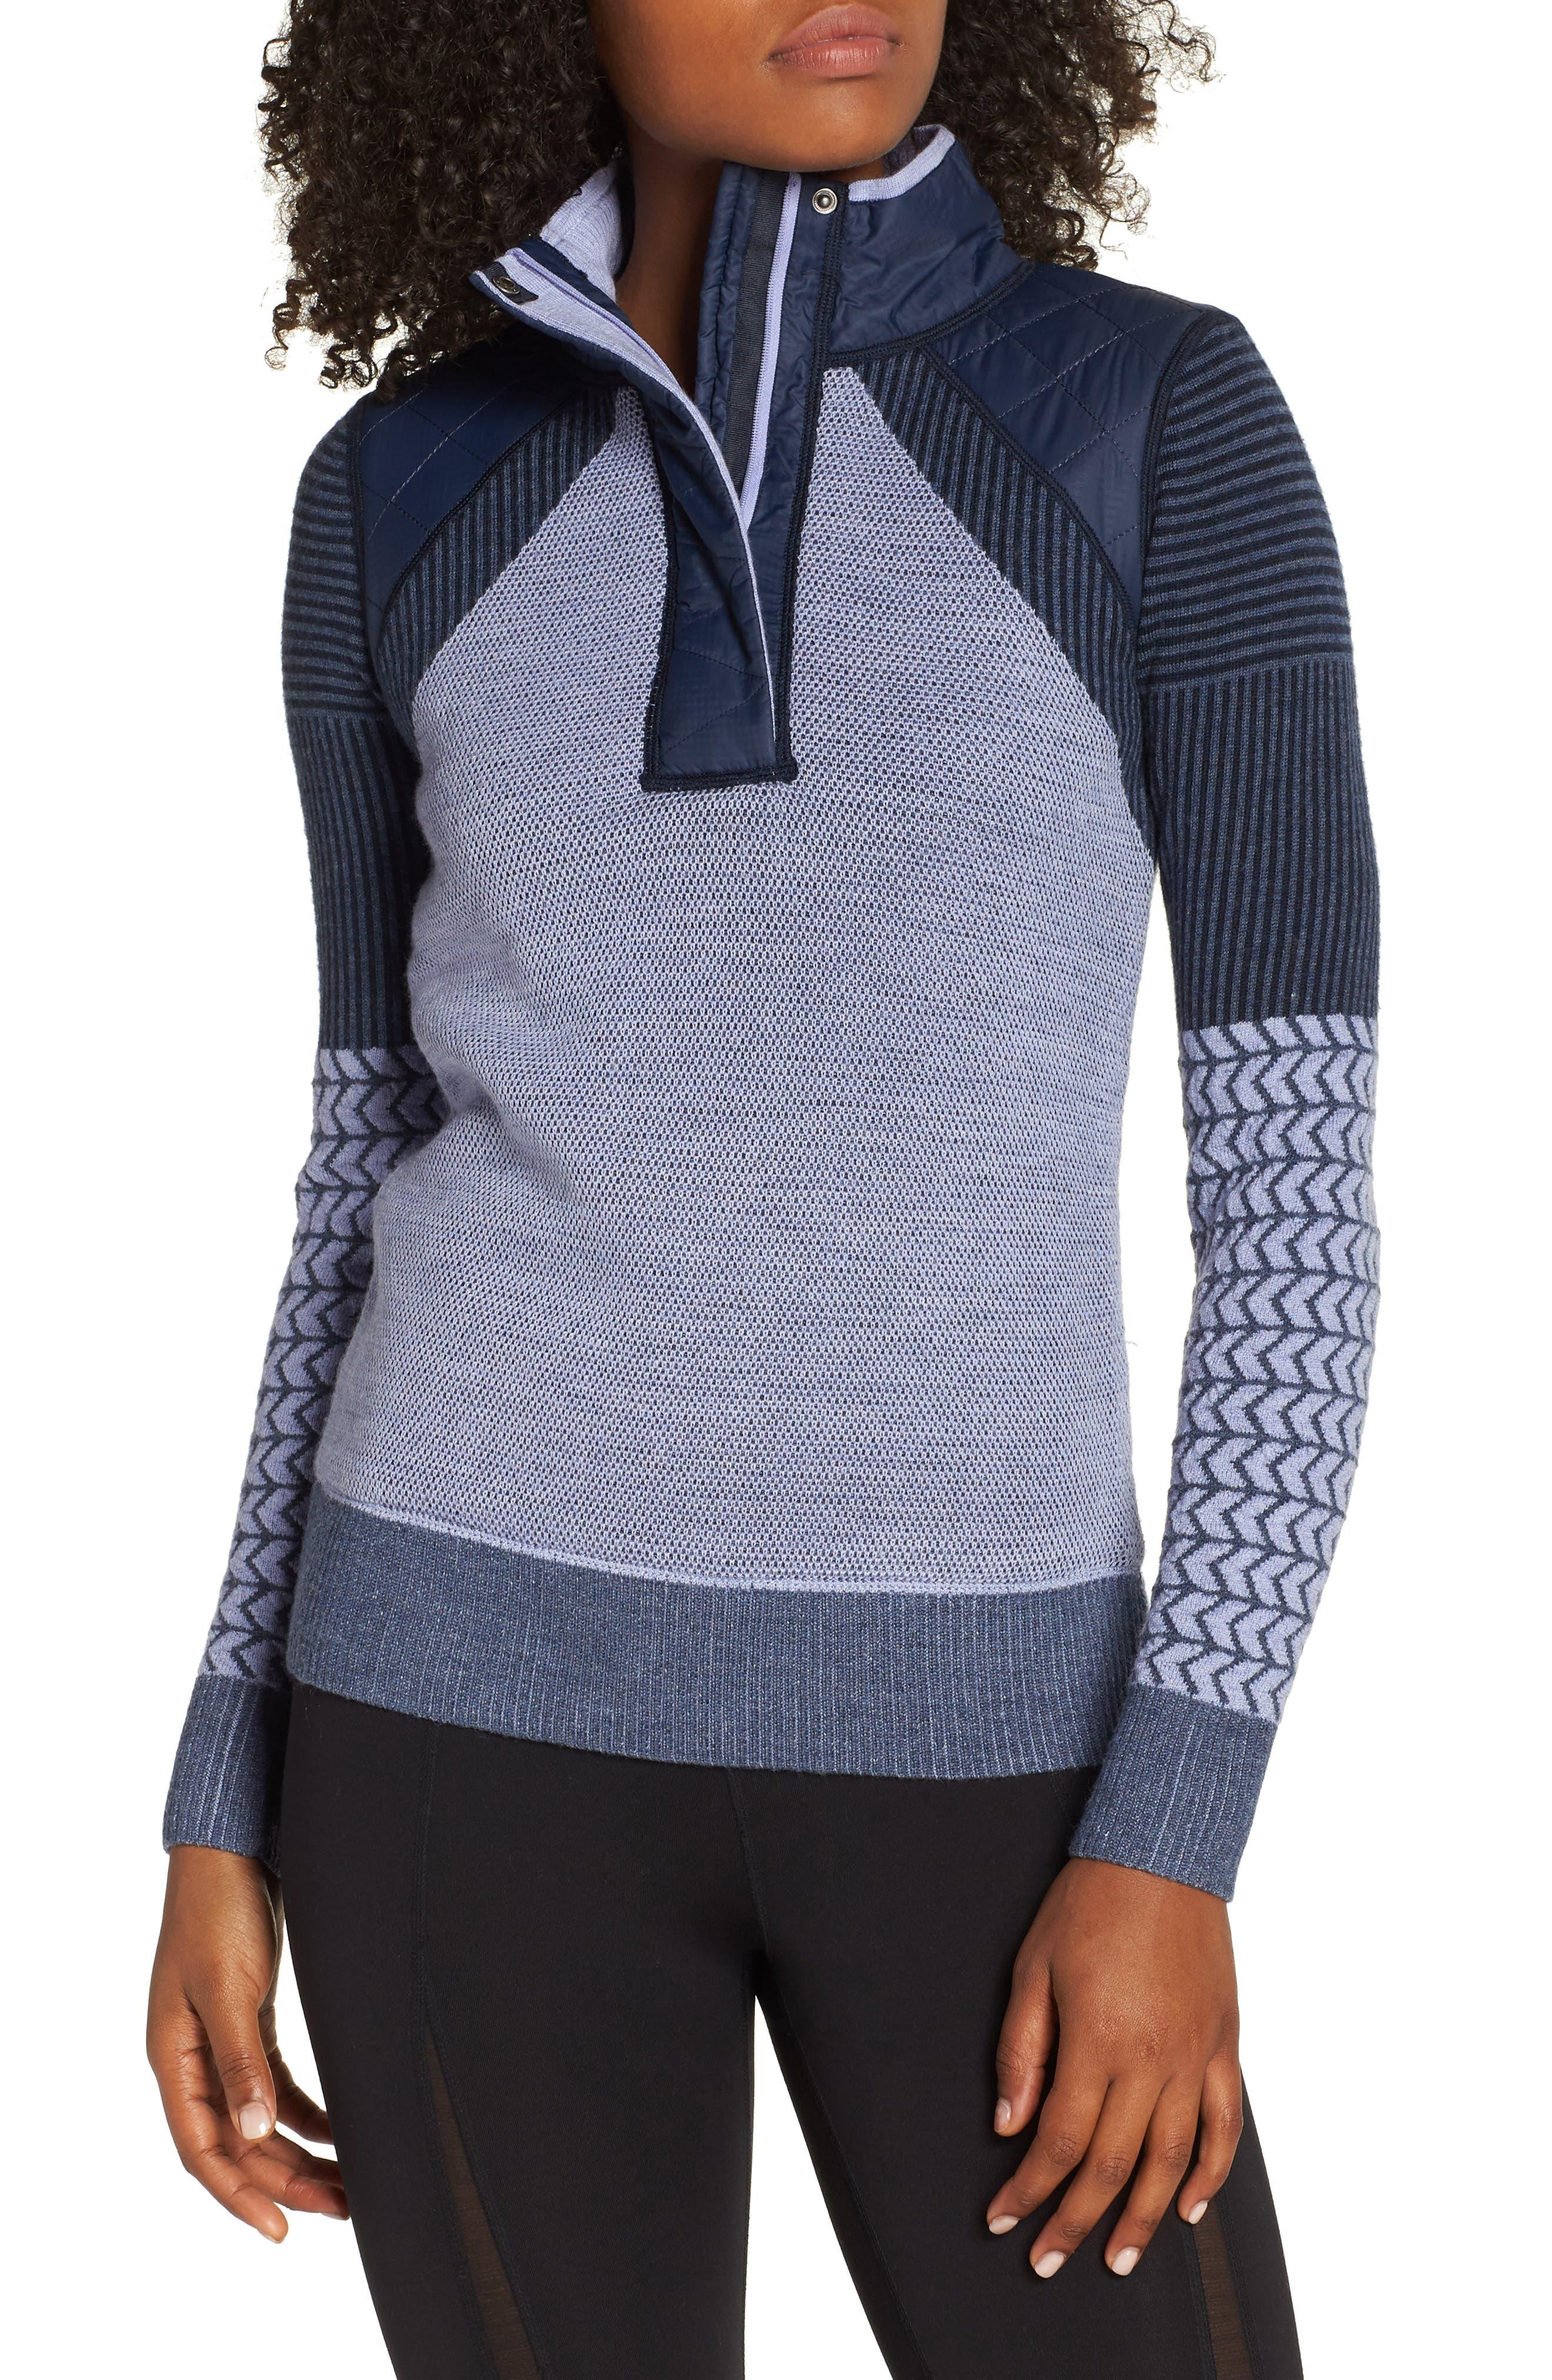 Ski Ninja Pullover Sweater,                         Main,                         color, 410